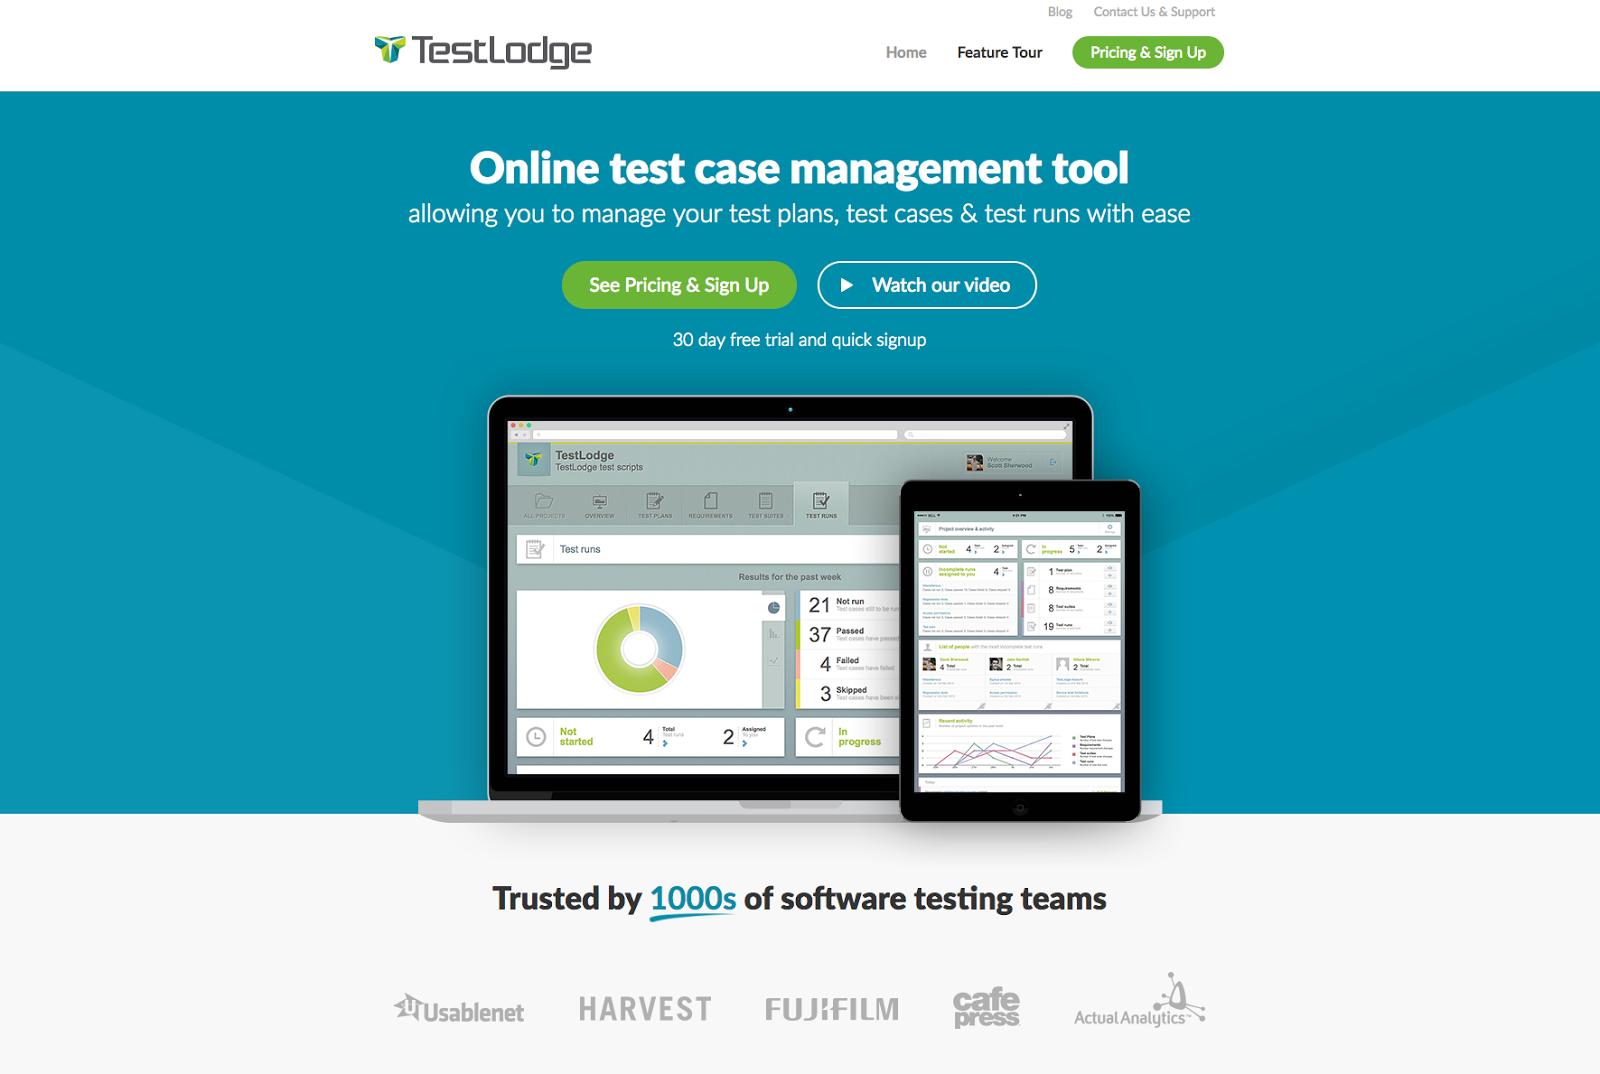 A taste of Testlodge's data dashboard